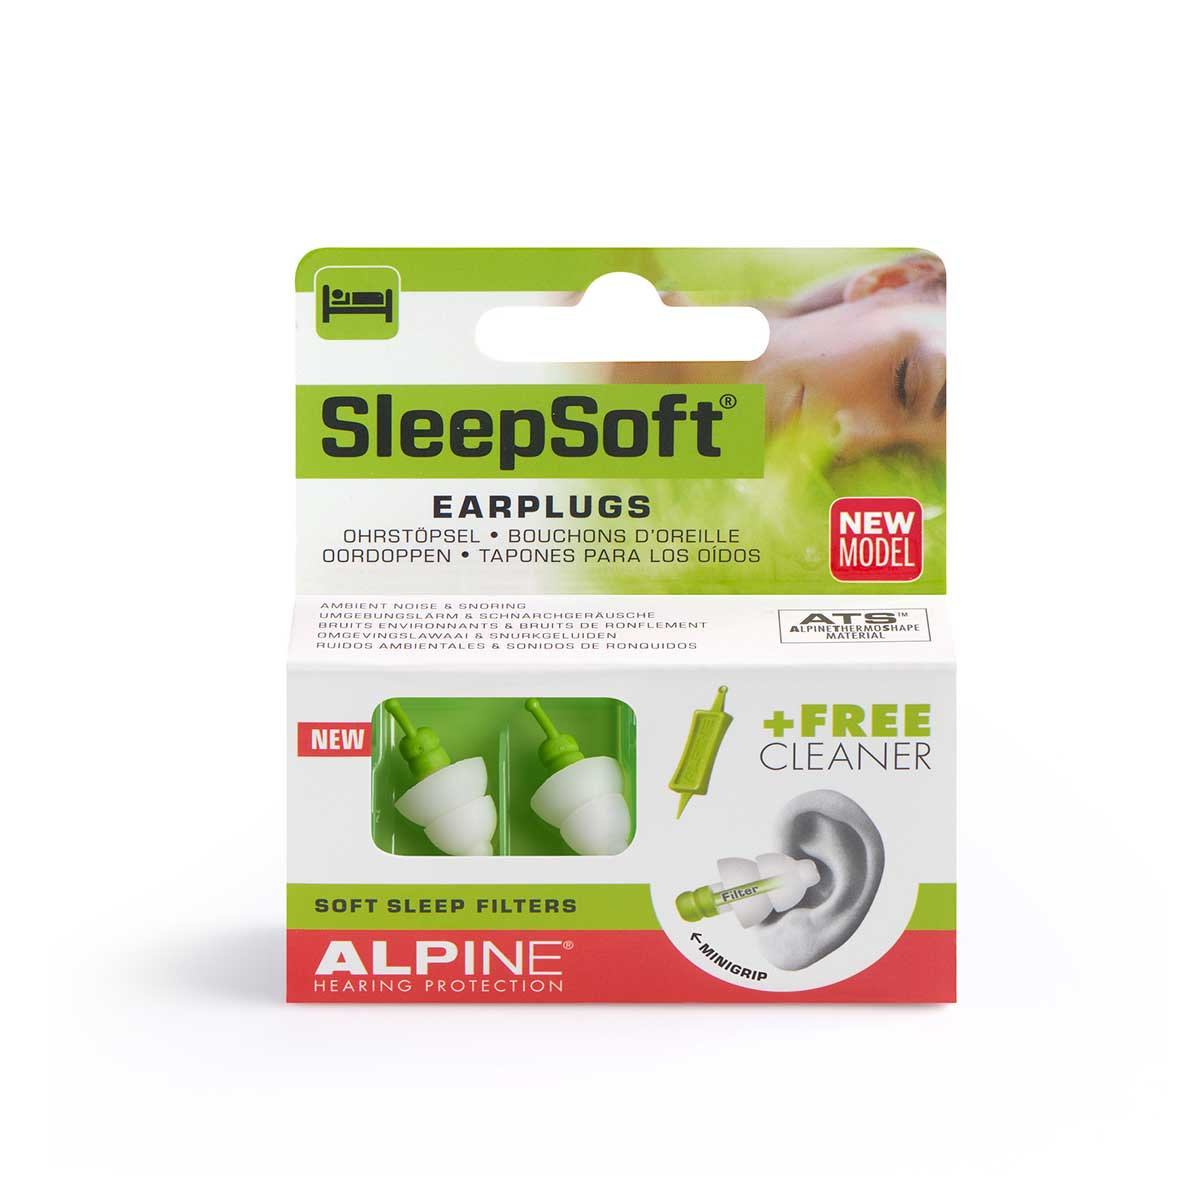 Sleepsoft-minigrip-packaging-earplugs-alpine-hearing-protection